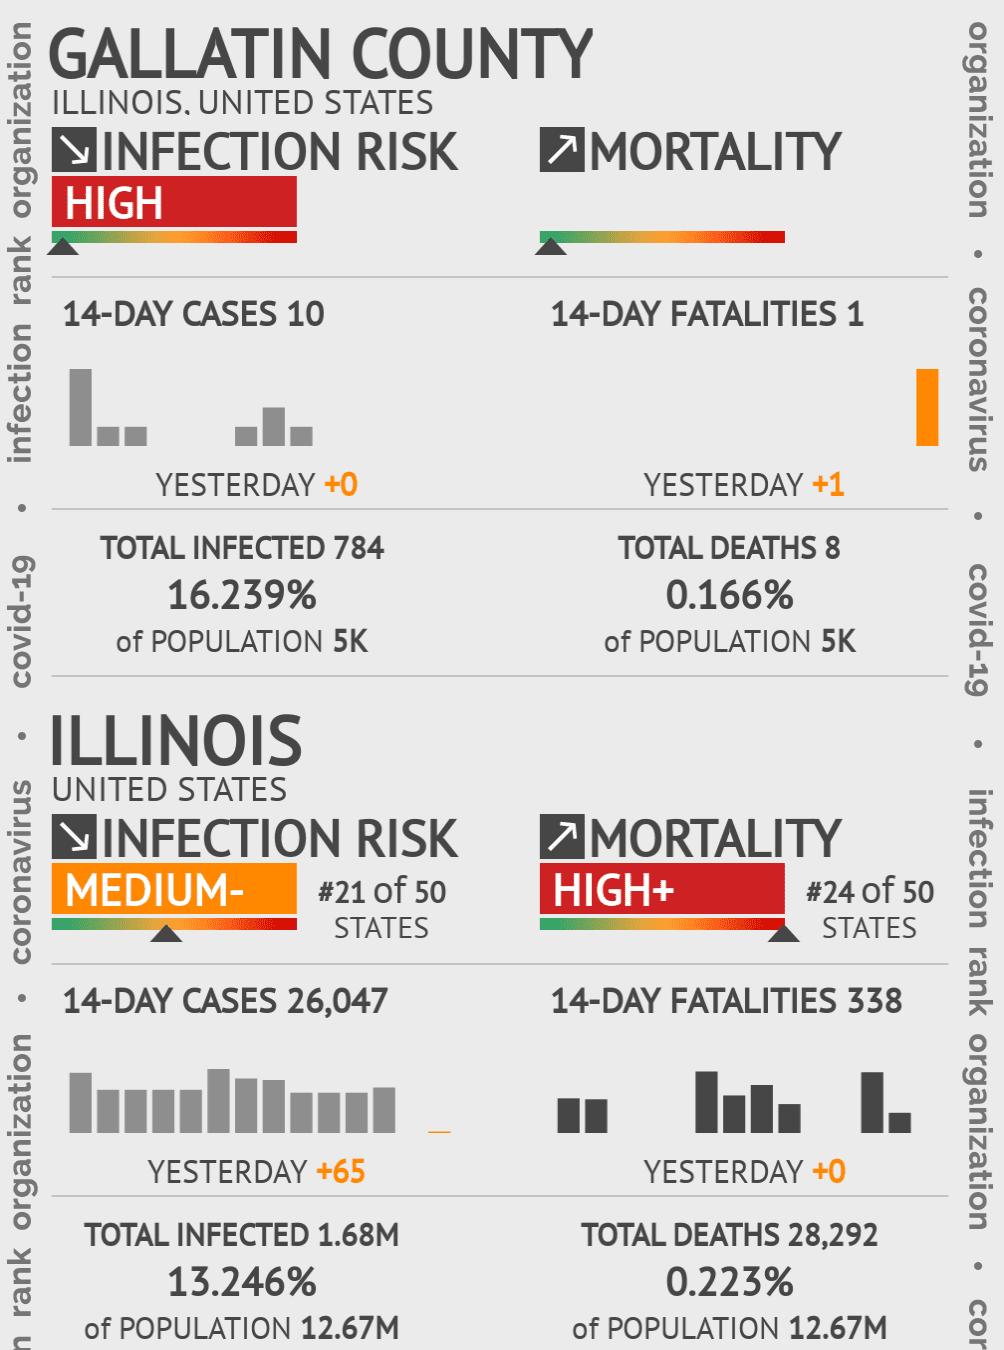 Gallatin County Coronavirus Covid-19 Risk of Infection on October 27, 2020